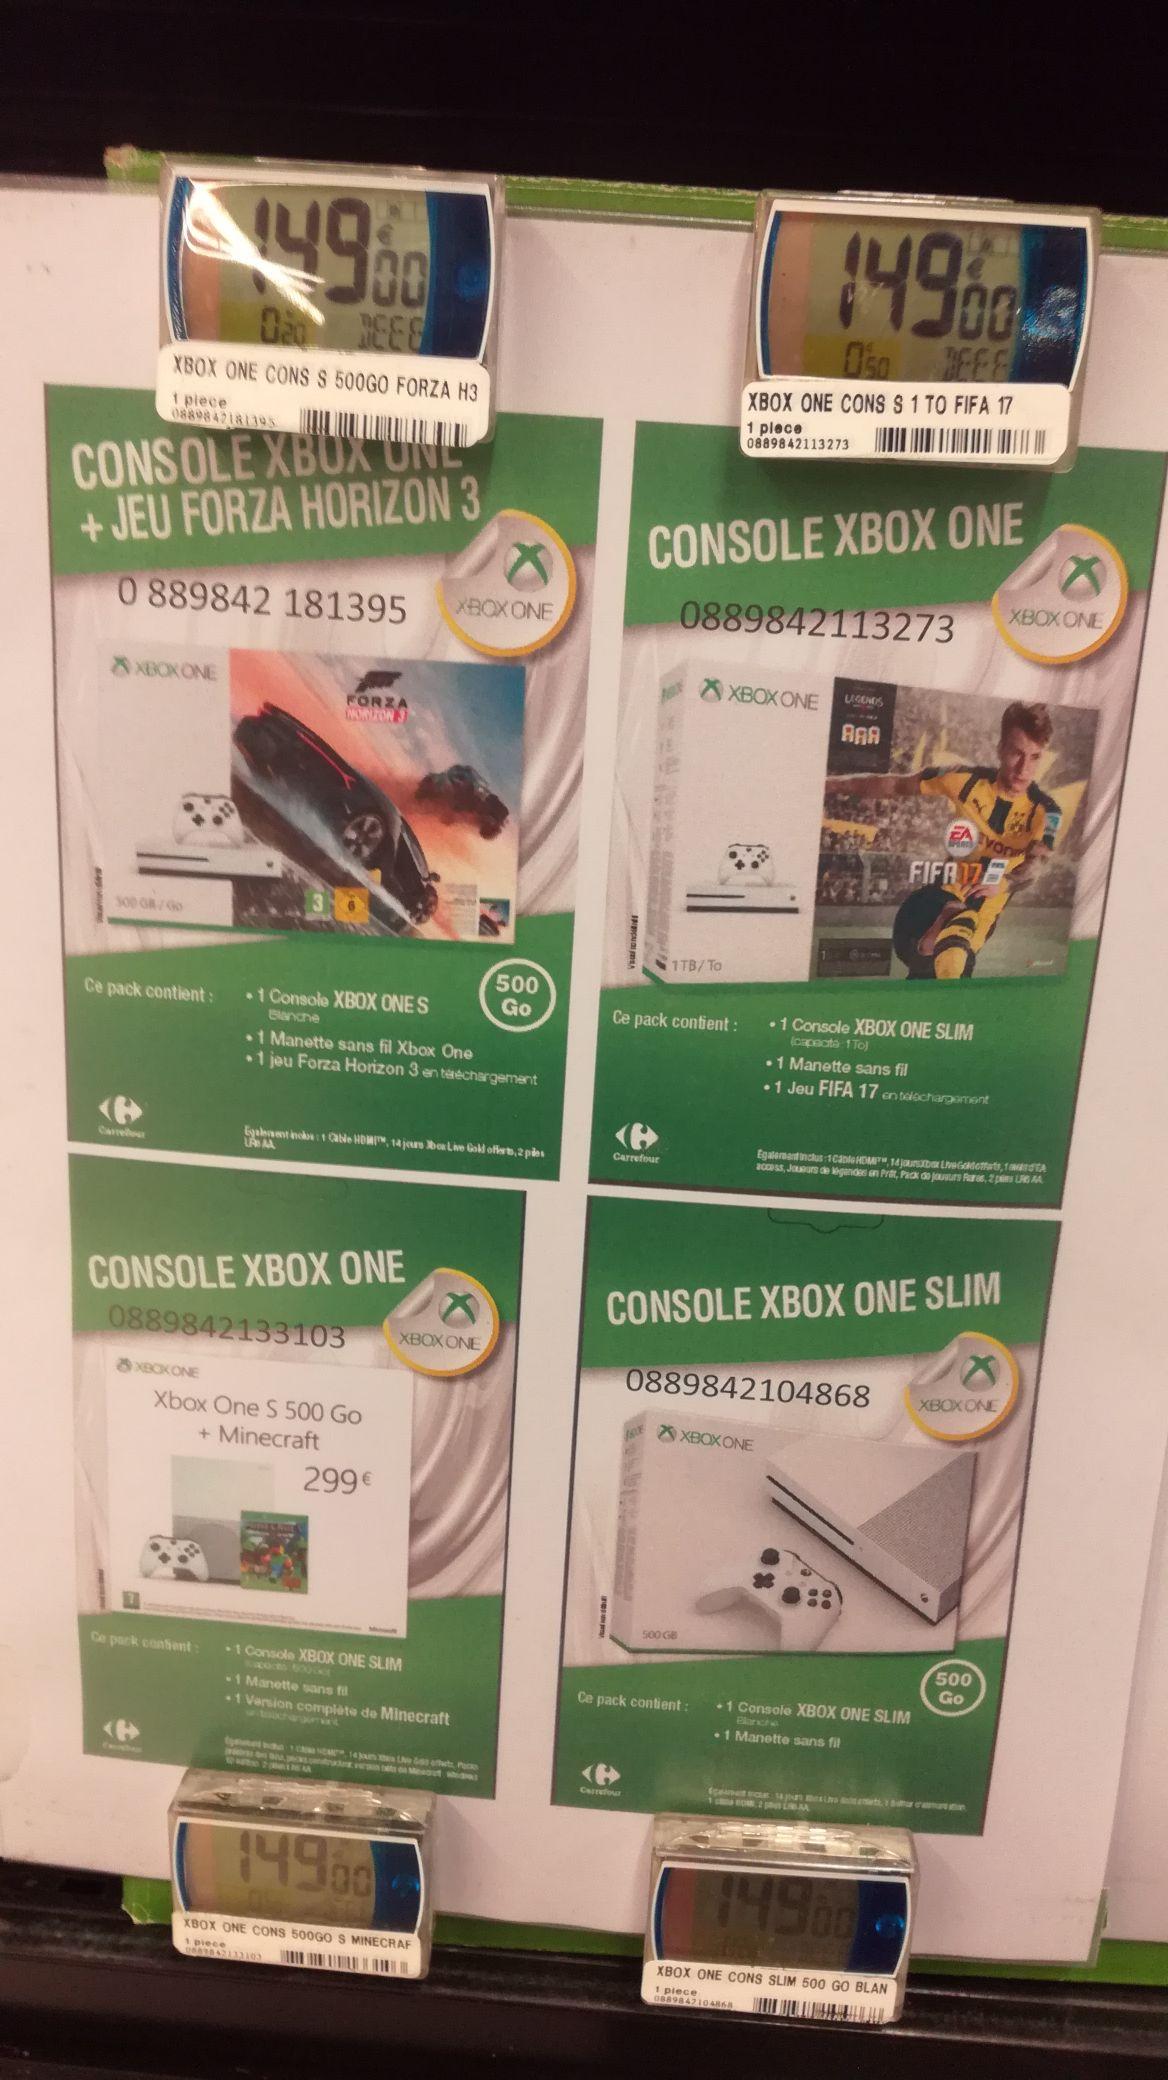 Pack console Microsoft Xbox One S (500 Go) + FIFA 17, Forza Horizon 3 ou Minecraft au Carrefour Saint-Herblain (44)